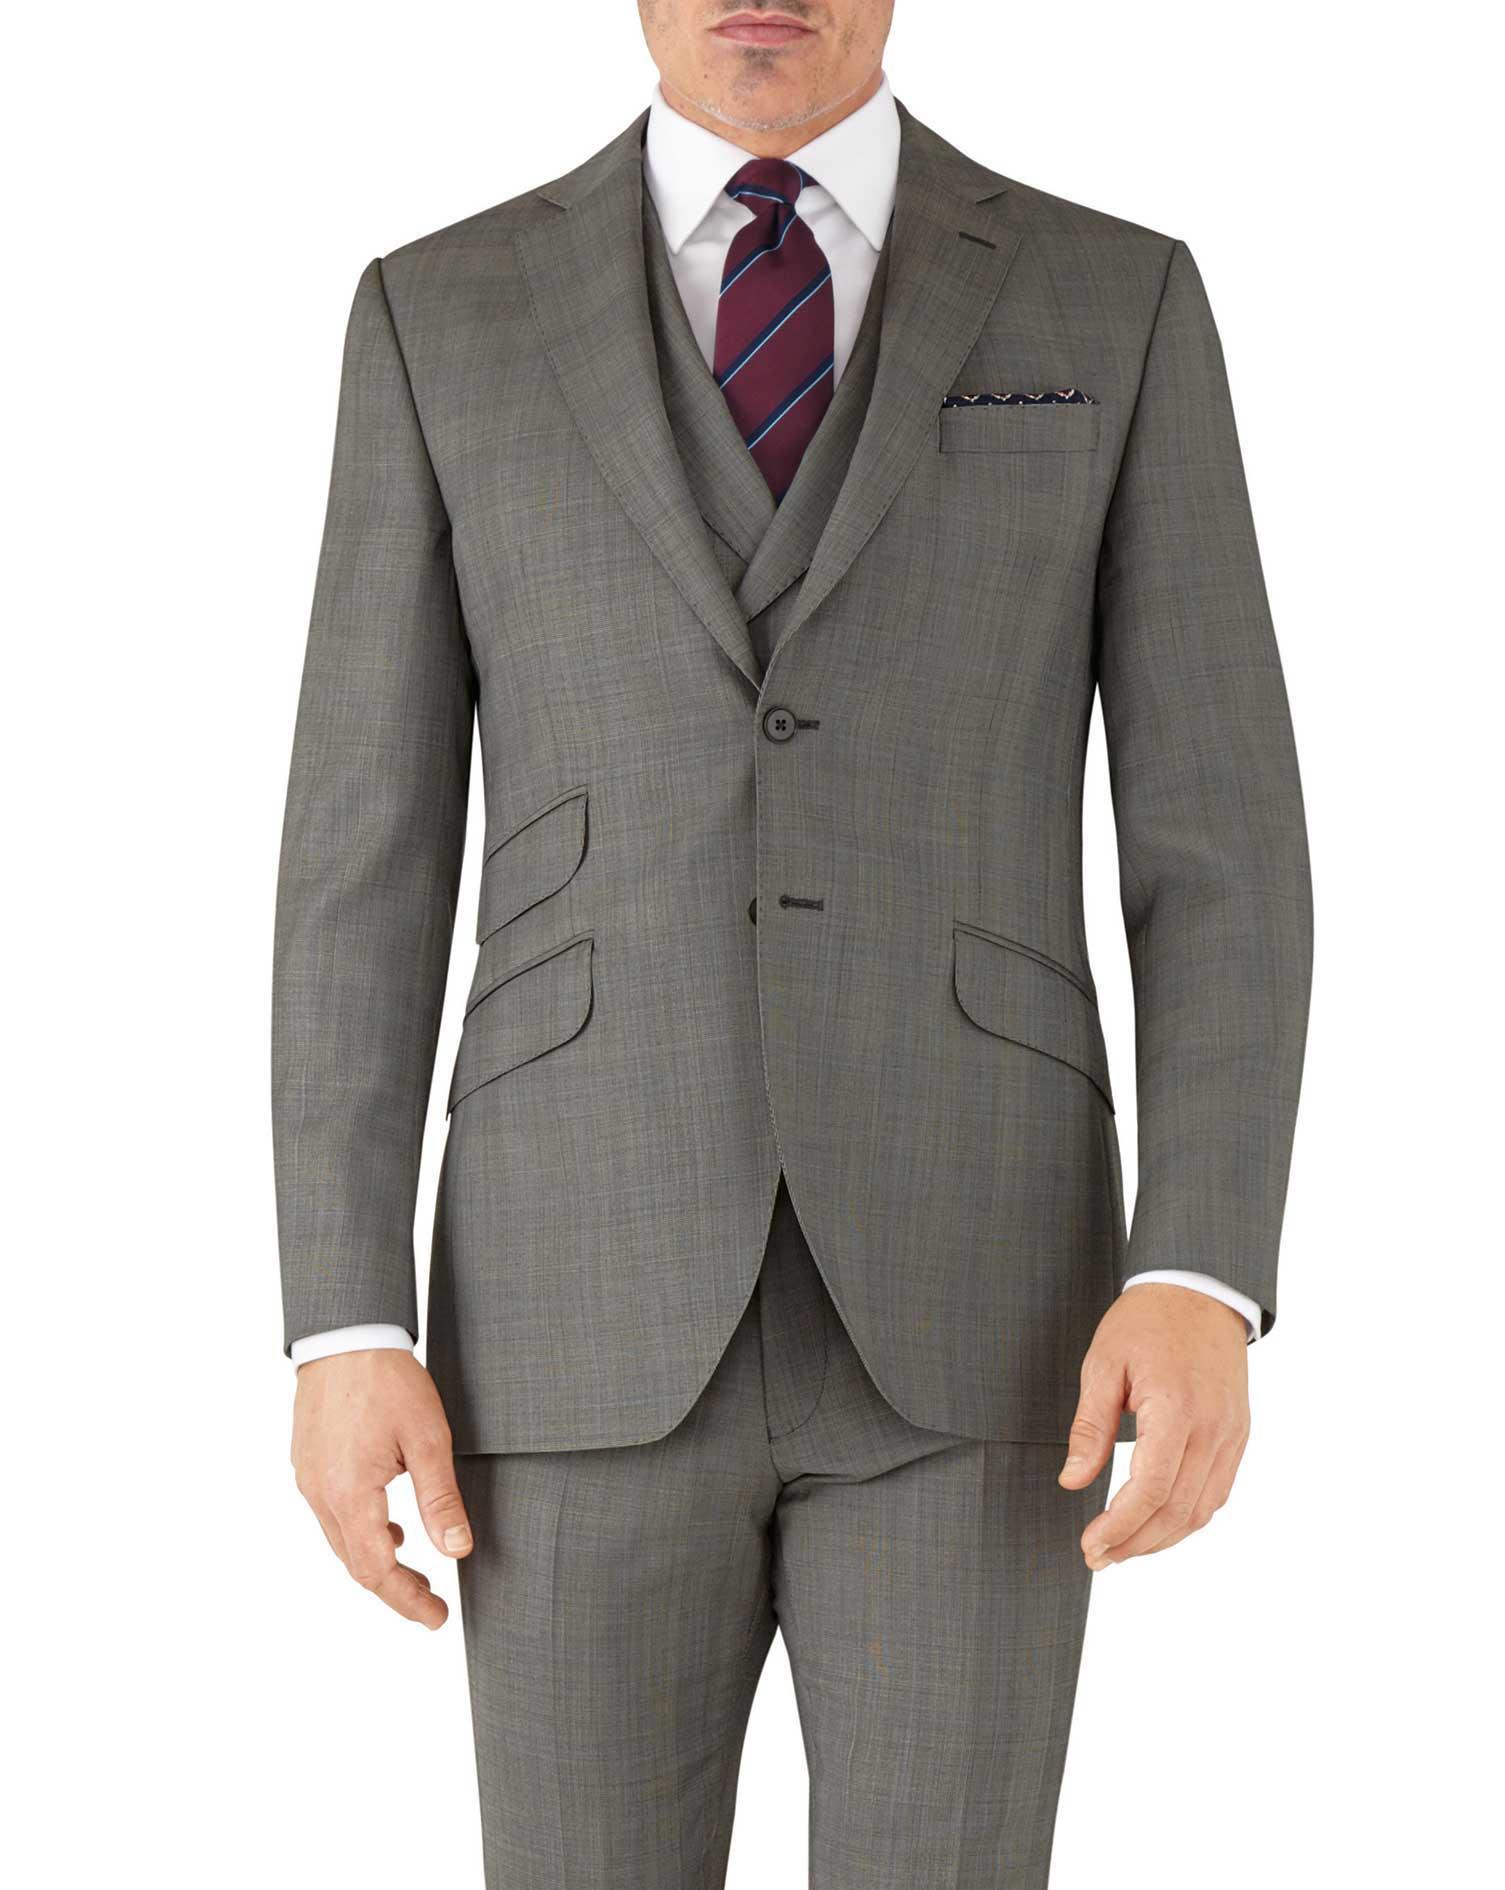 Silver Slim Fit Italian Sharkskin Luxury Check Suit Wool Jacket Size 38 Short by Charles Tyrwhitt